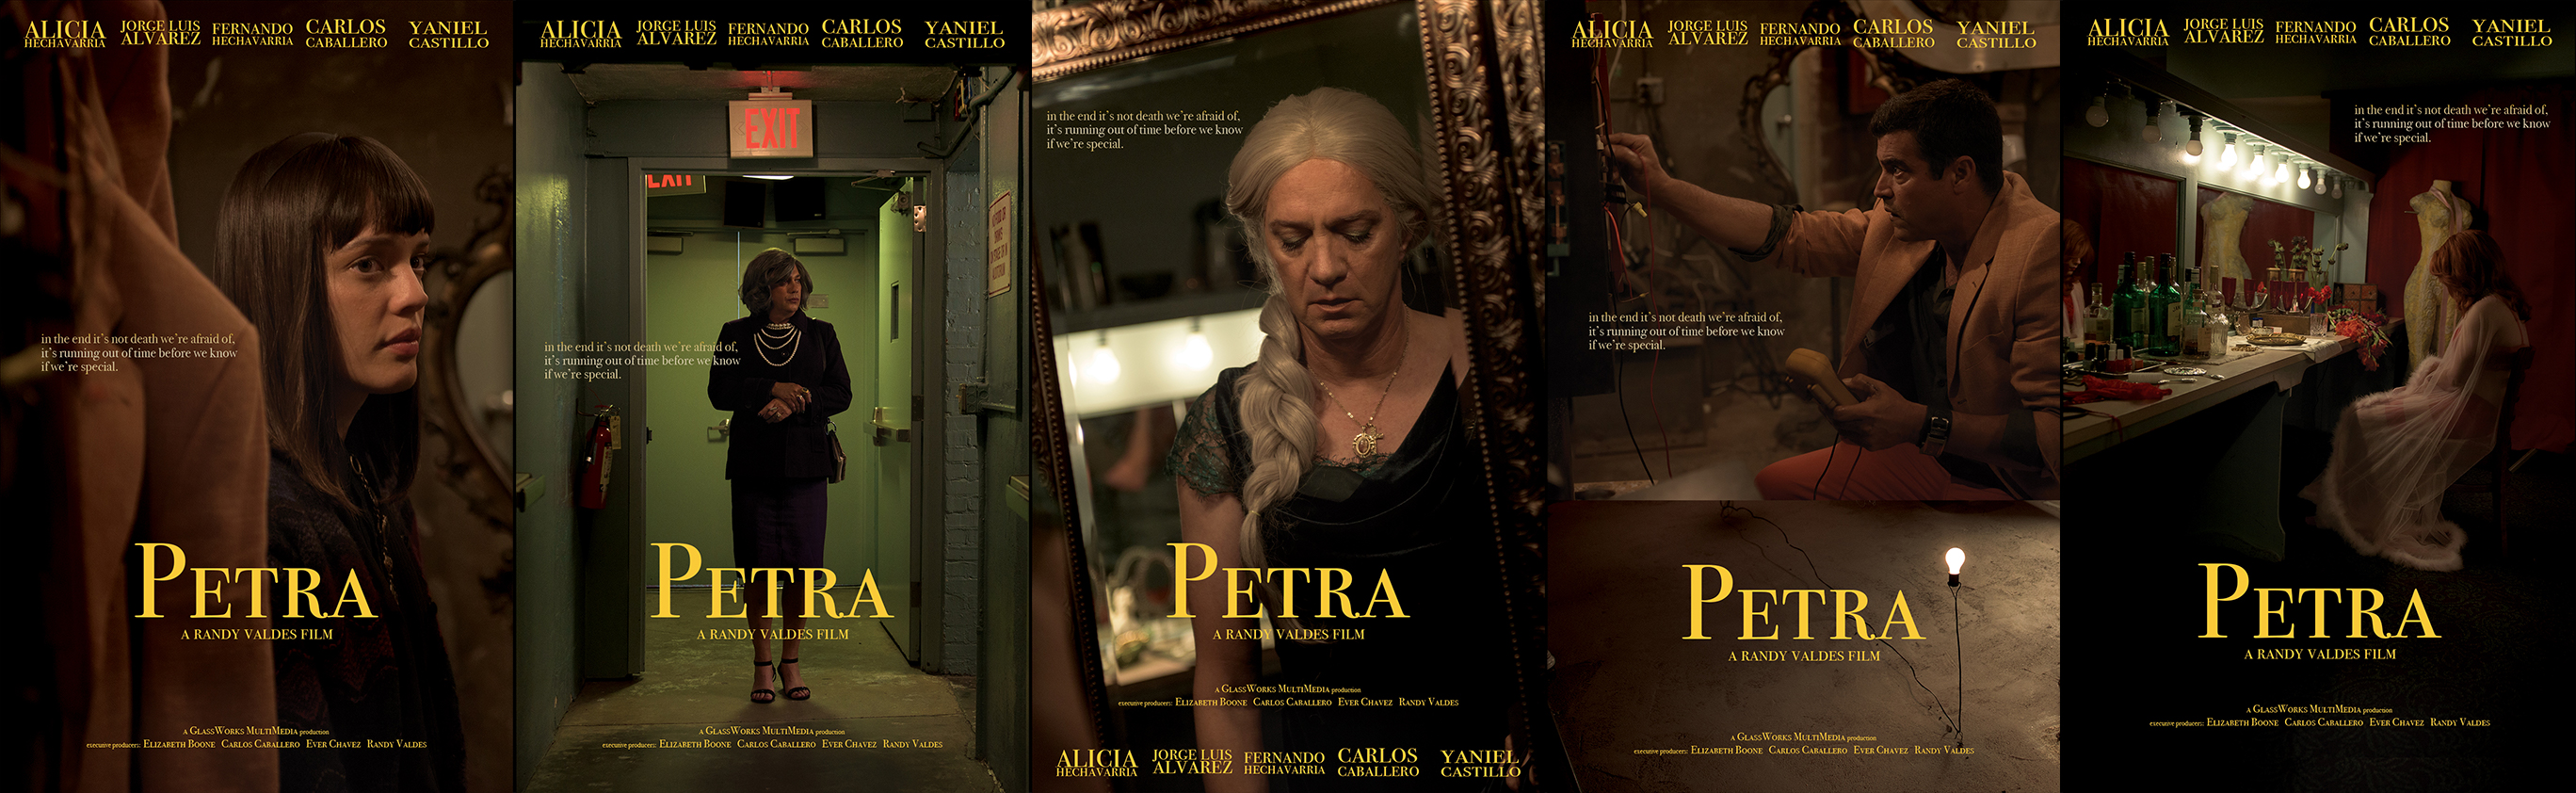 Petra Short Film Poster BANNER